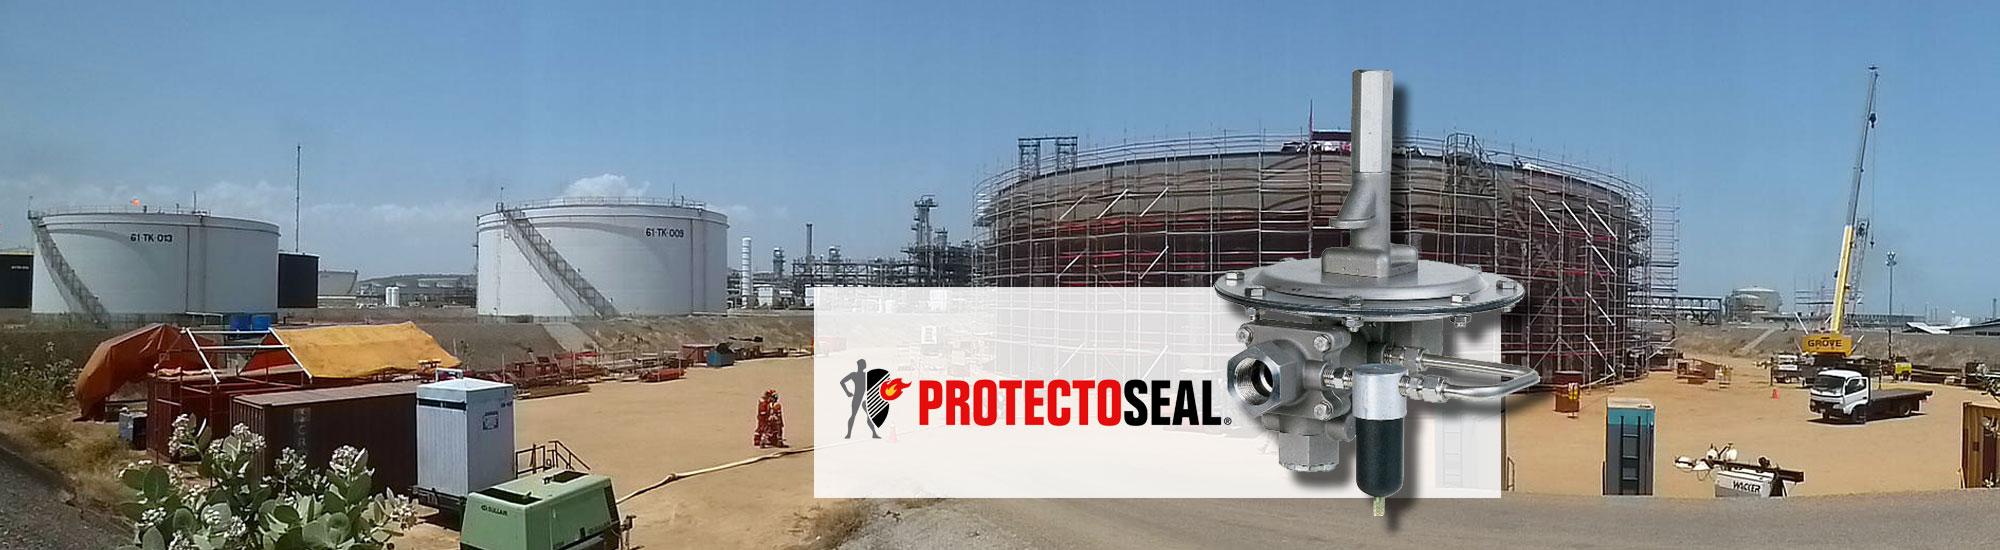 sliderxcaret-protectoseal-new